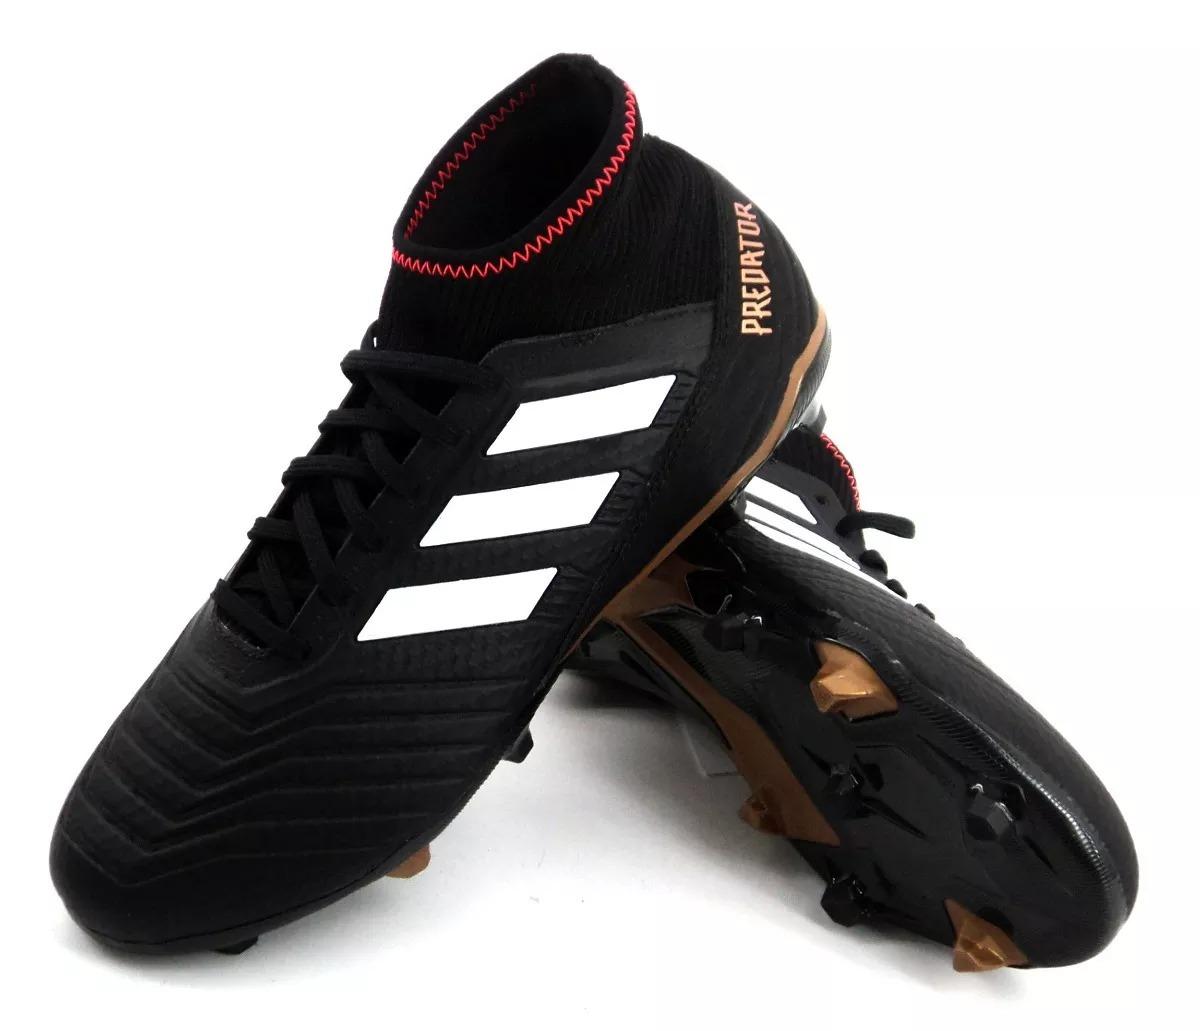 botin adidas predator 18.3 fg negro fútbol niño 9010 eezap. Cargando zoom. 18aa65d44f5ae